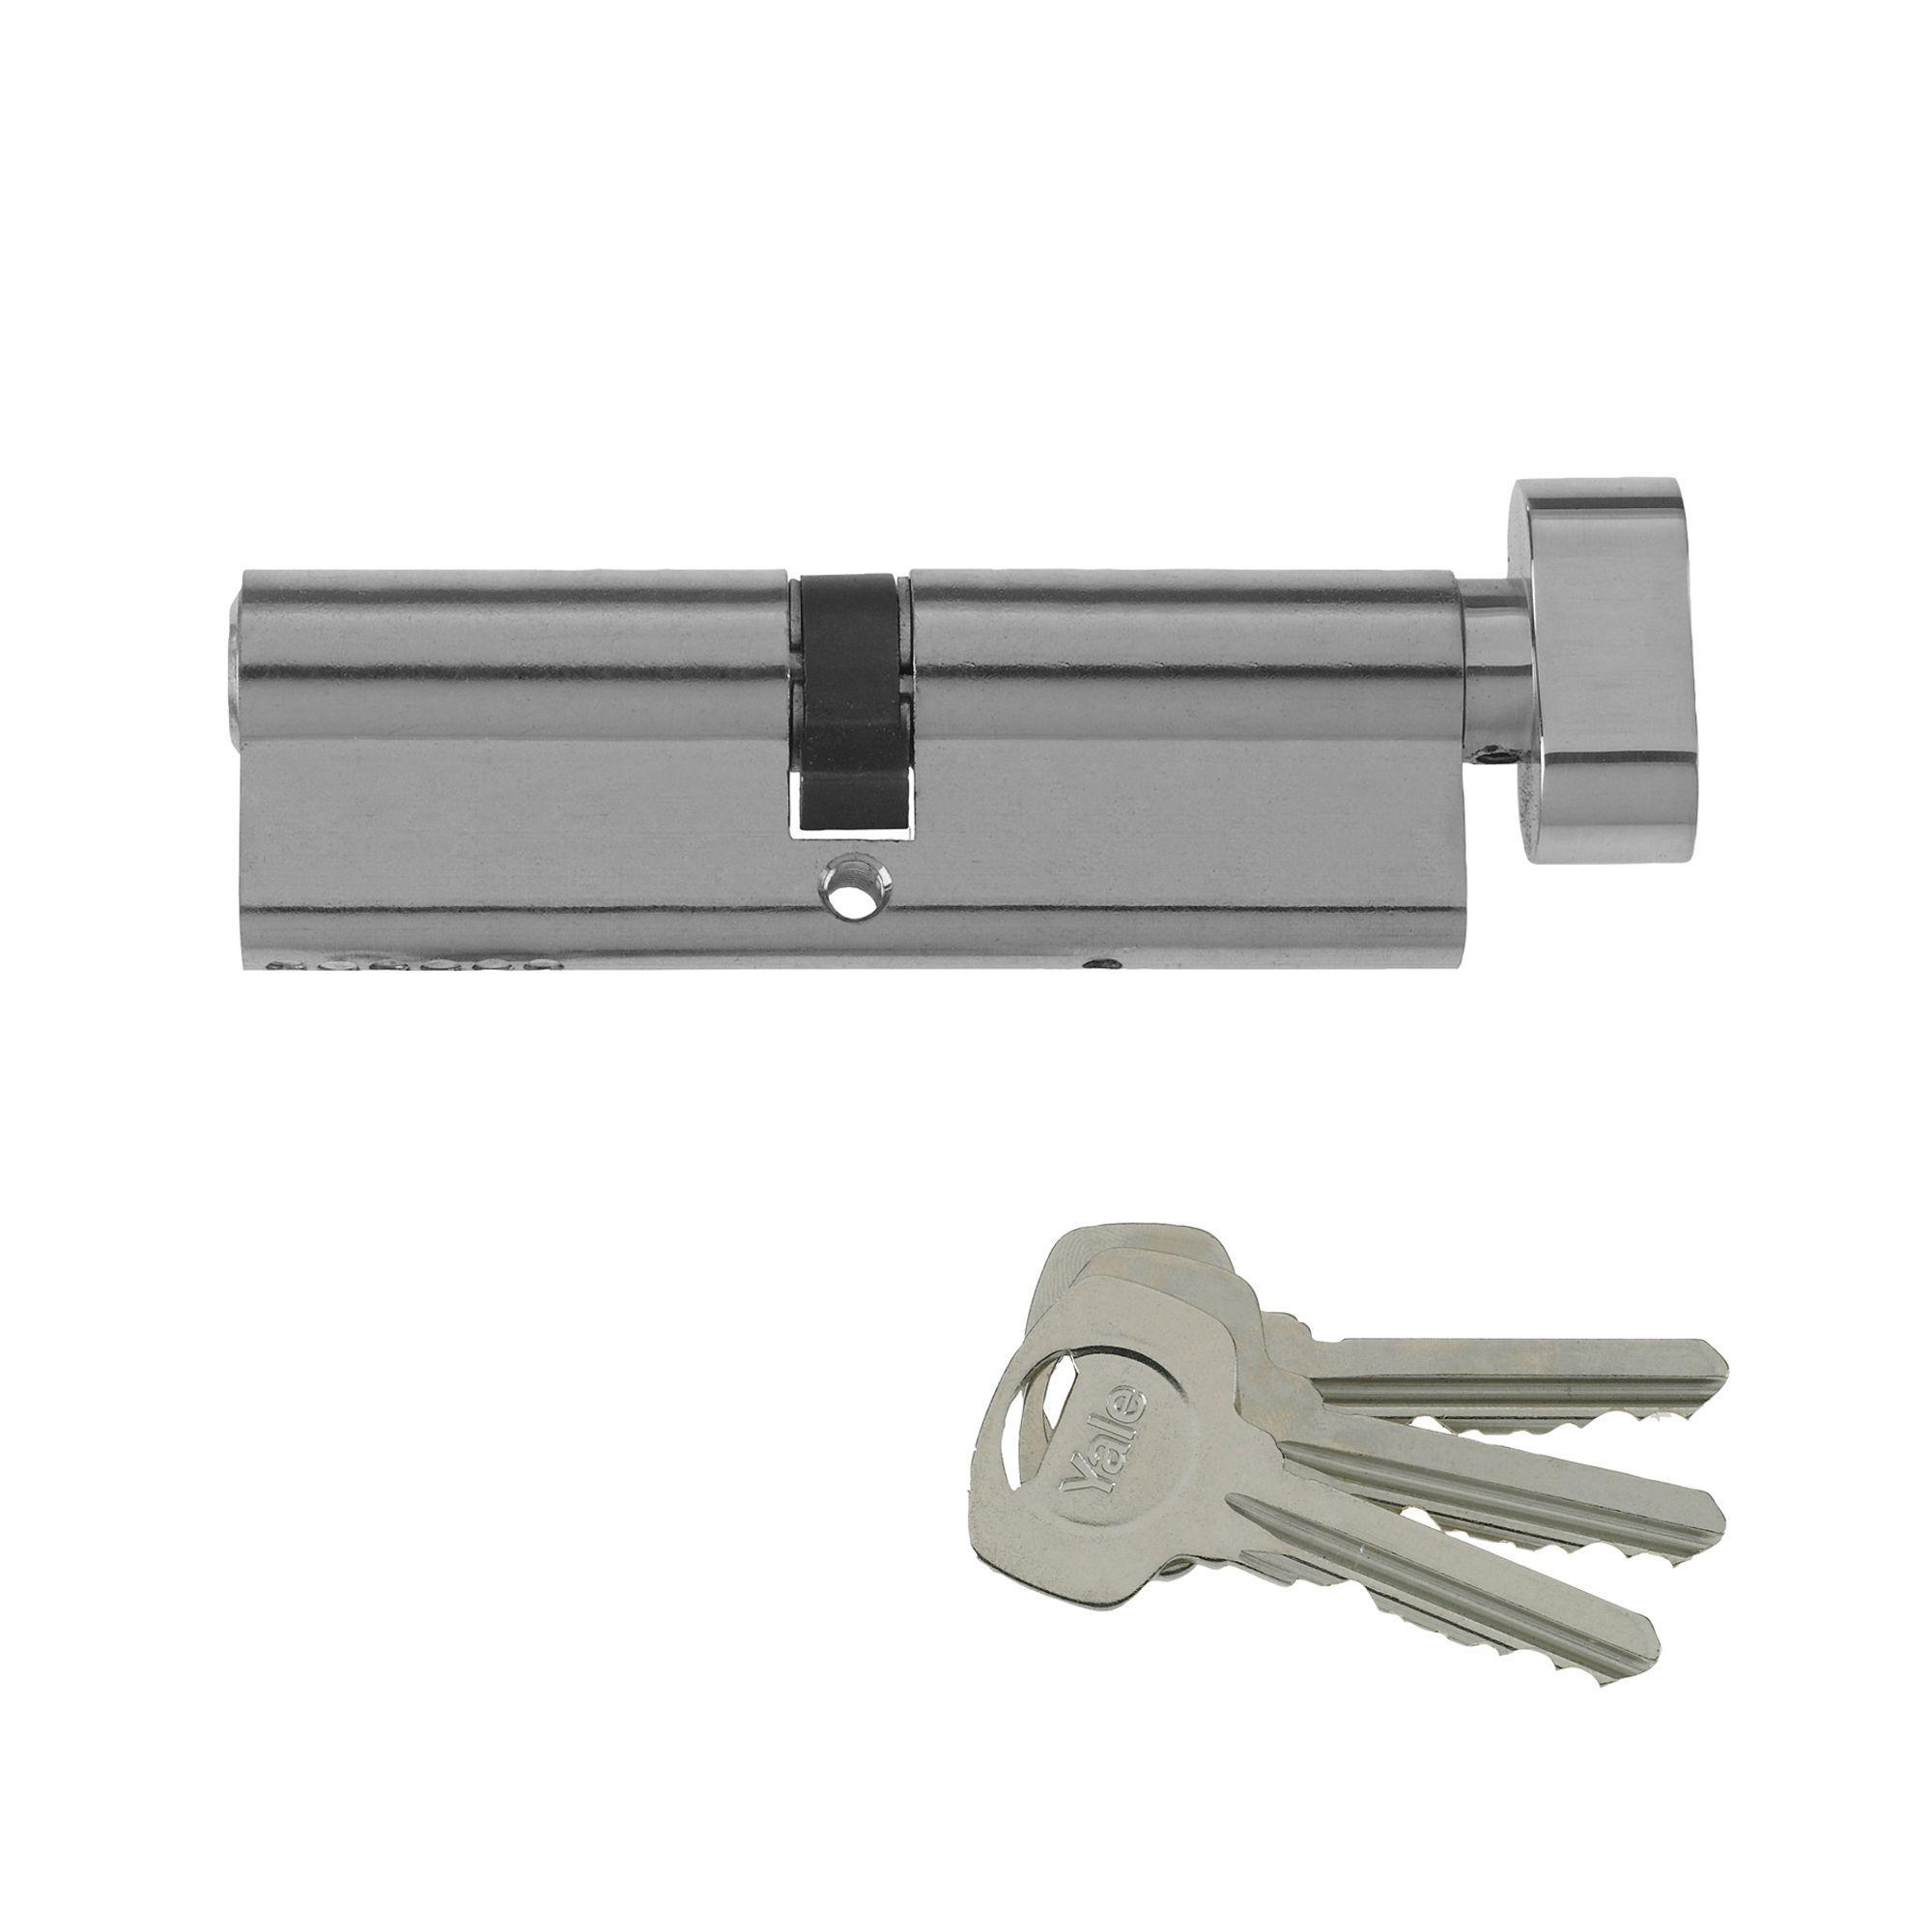 Yale 70mm Nickel-plated Thumbturn Euro Cylinder Lock